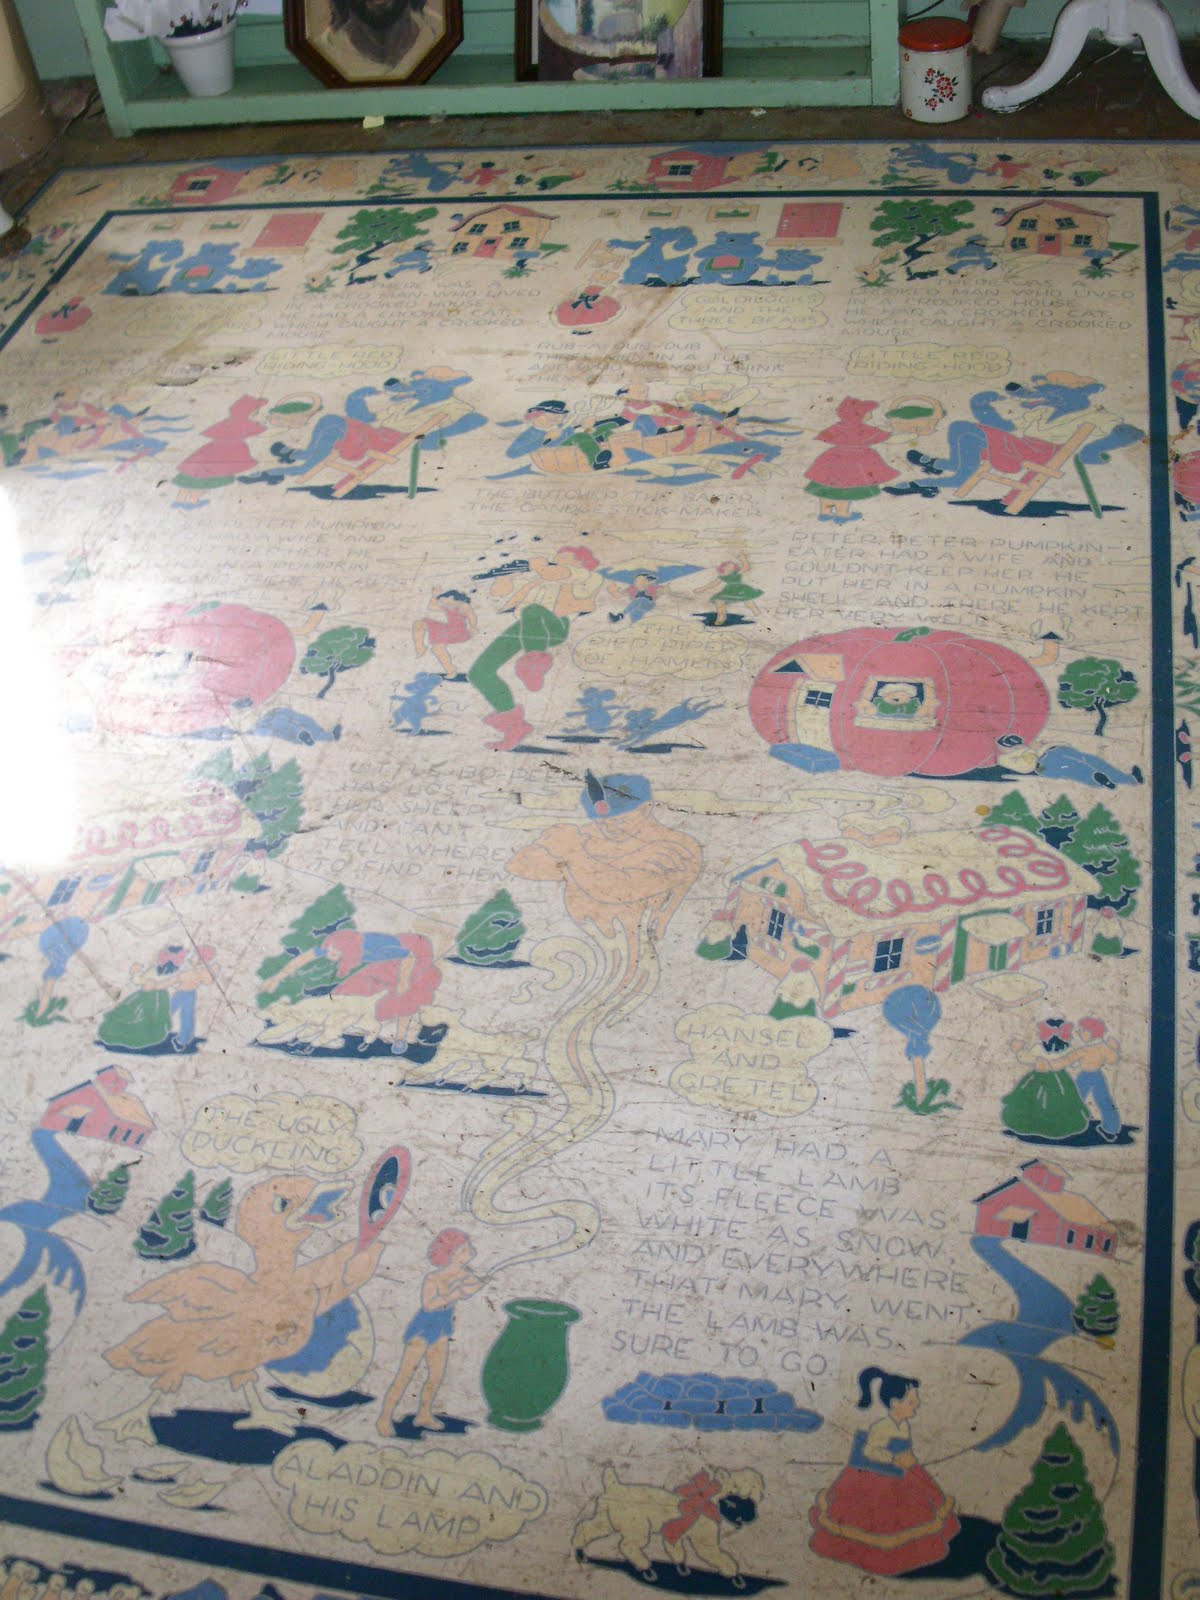 Linoleum Flooring For Sale Of All My Favorite Things Linoleum Carpets Children 39 S